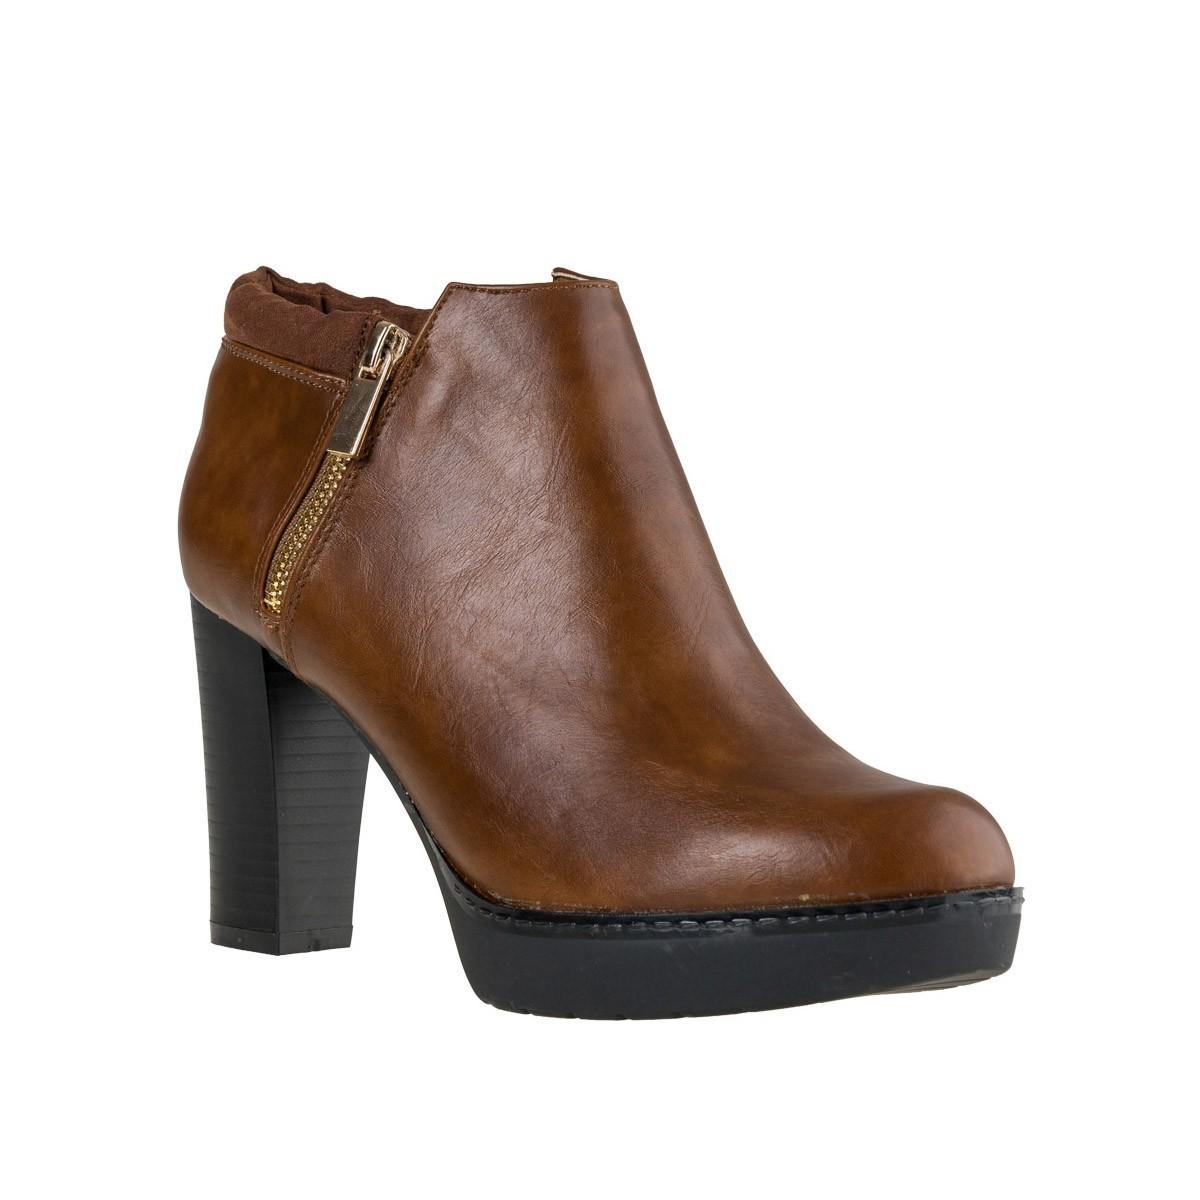 Fashion Icon Γυναικεία Παπούτσια Μποτάκια F24-2539 Κάμελ Fashion icon F24-2539 Κάμελ